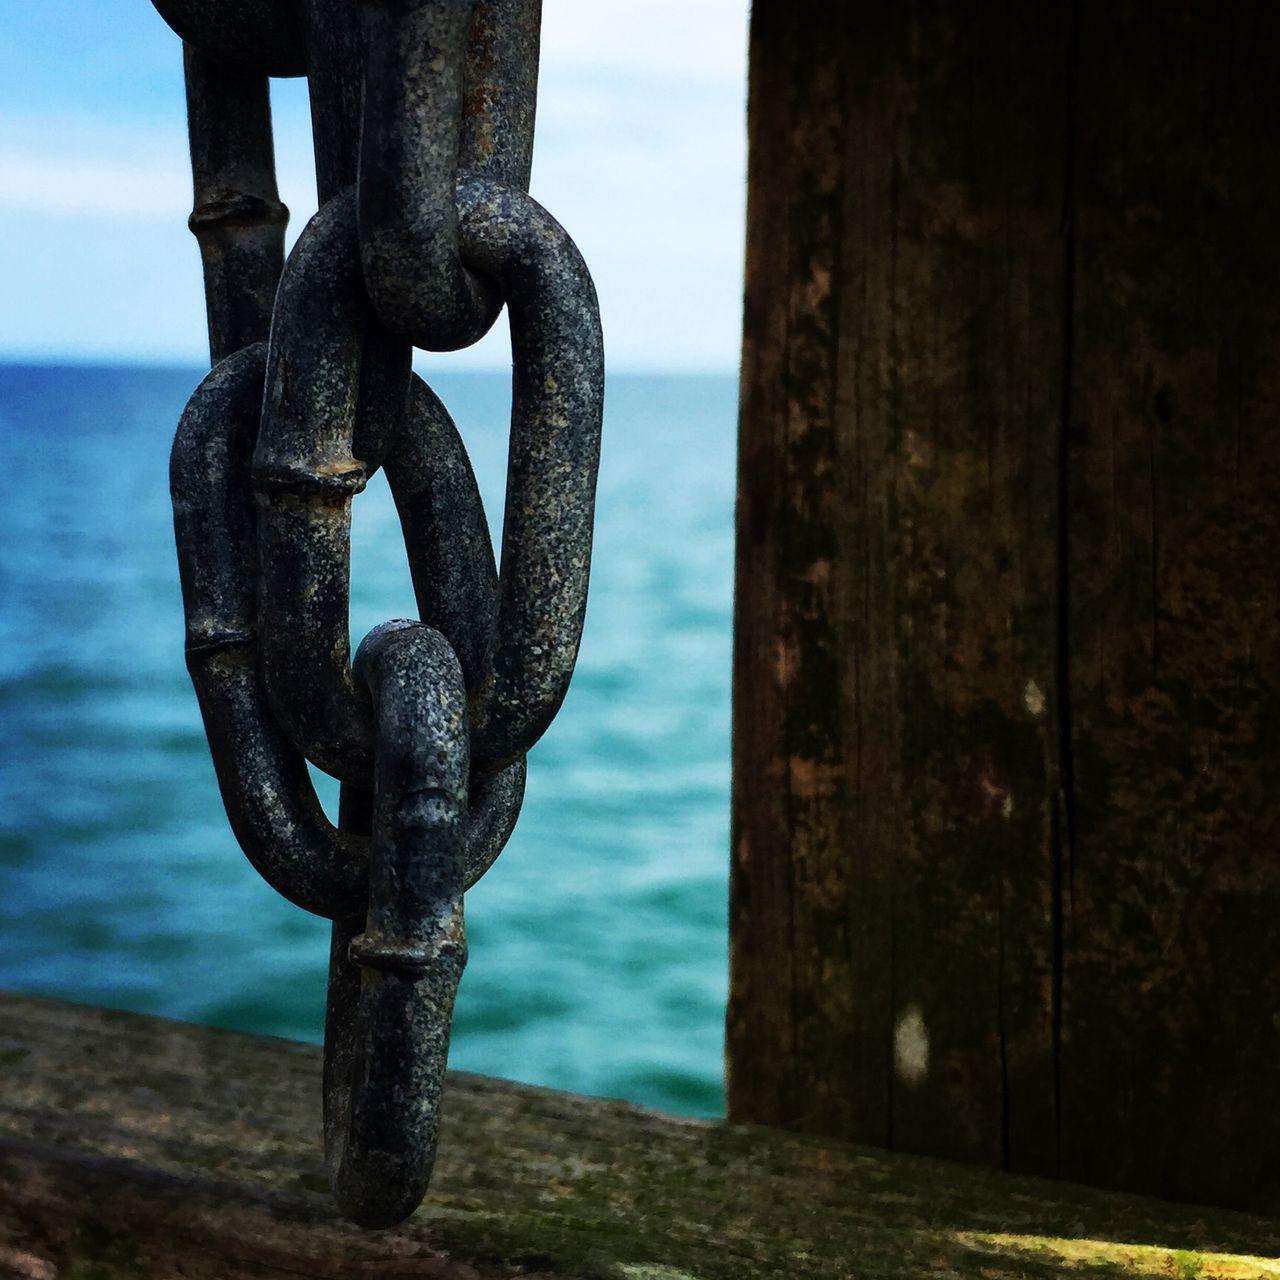 Jax beach Florida JacksonvilleFL Atlantic Ocean Chain